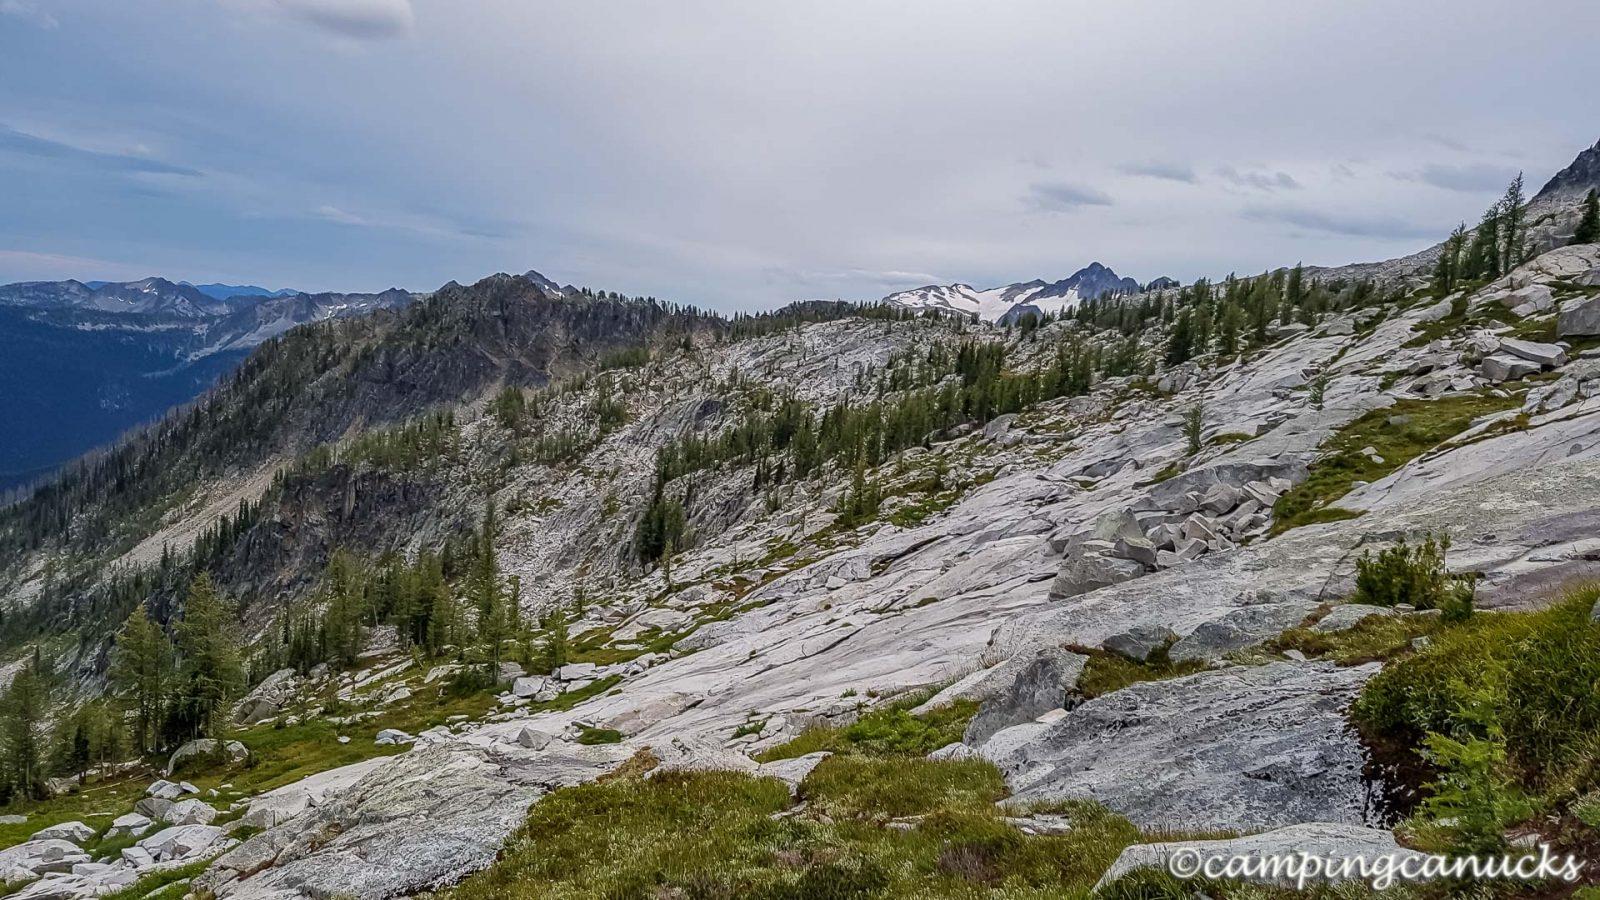 Along the Silver Spray Trail